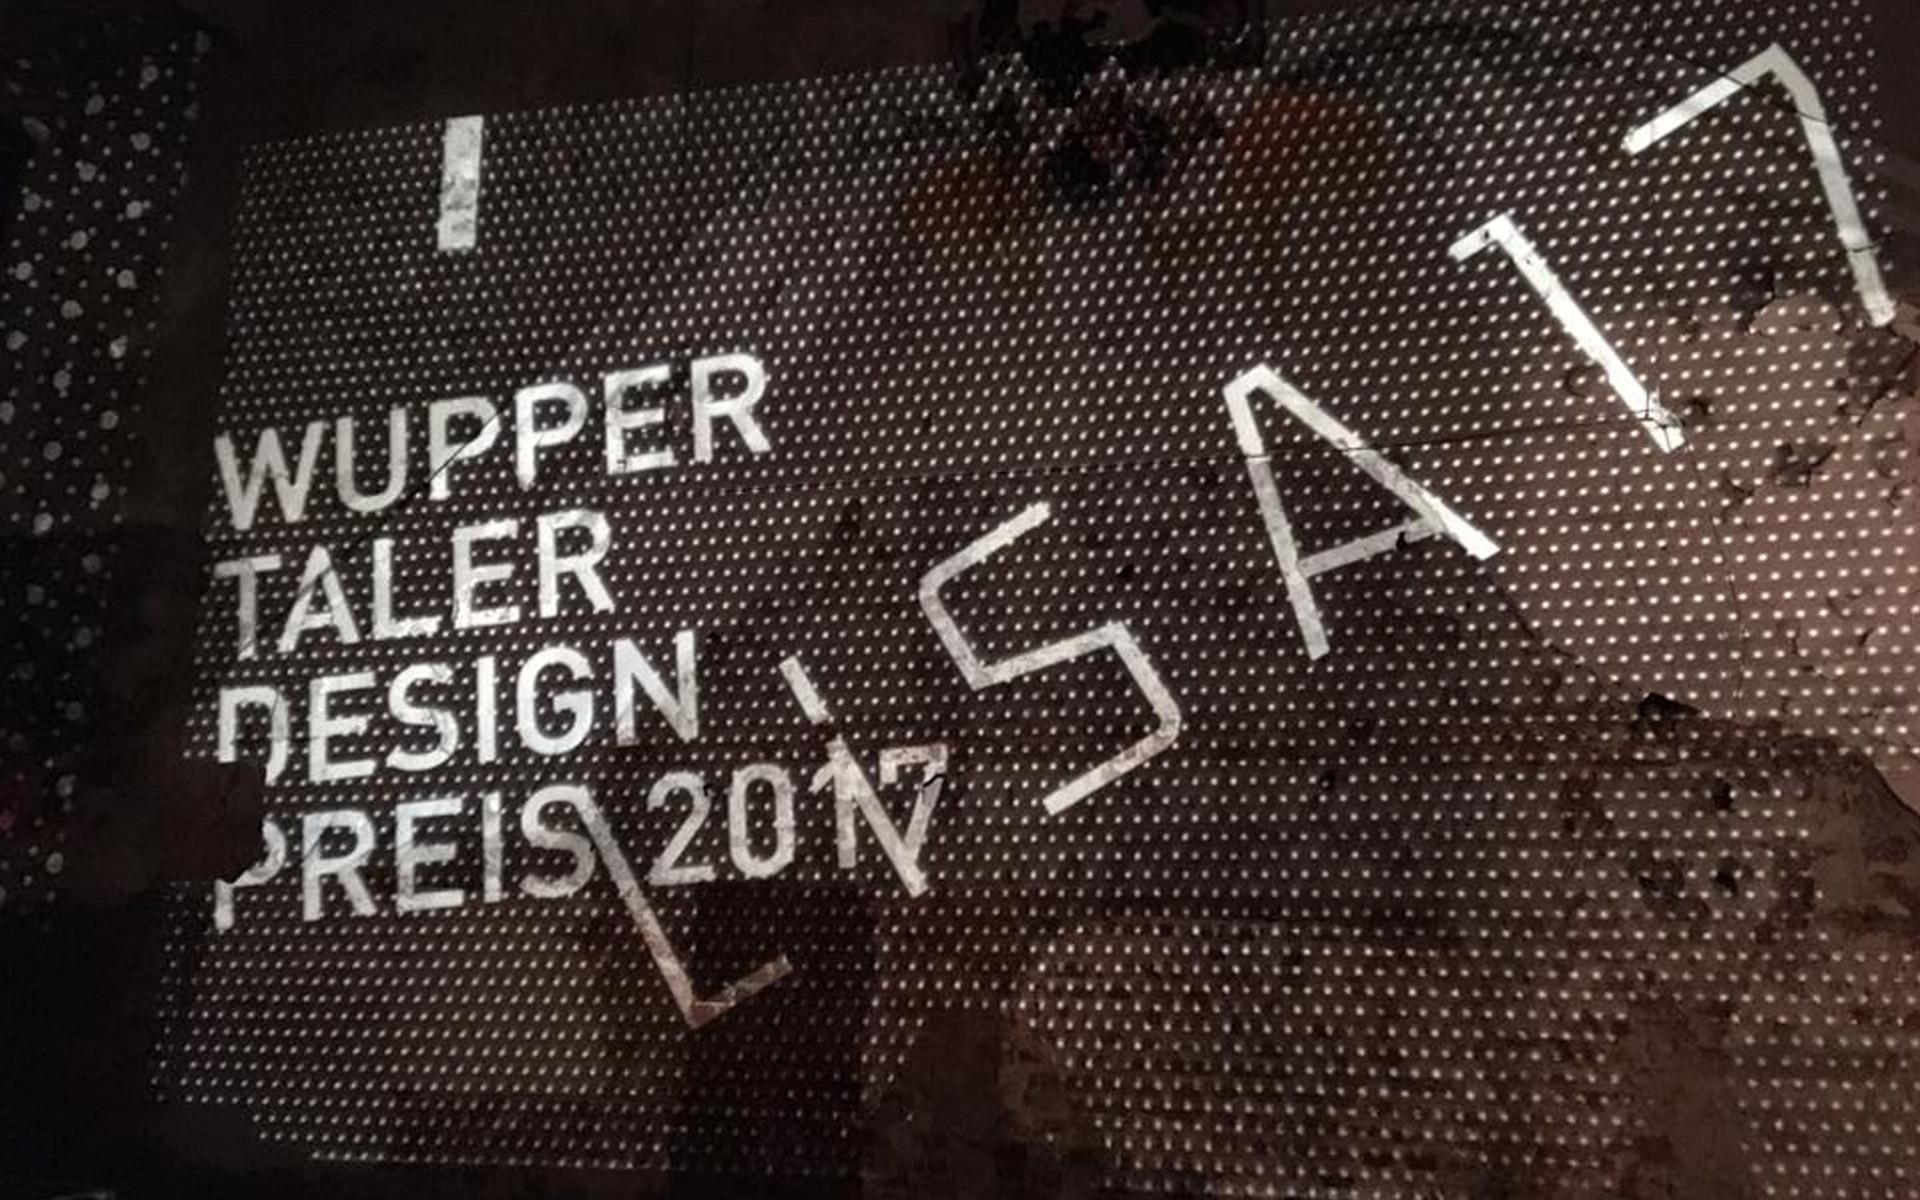 Designpreis-Wuppertal 2017